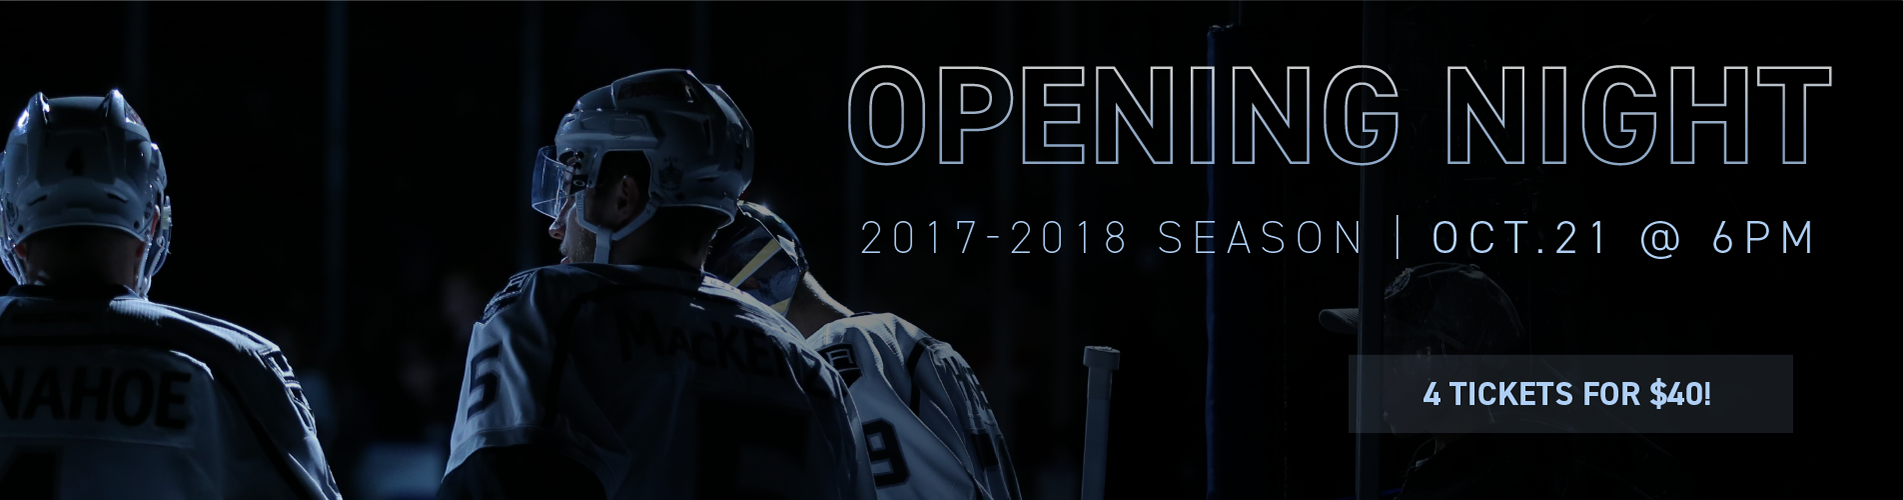 Opening%20night